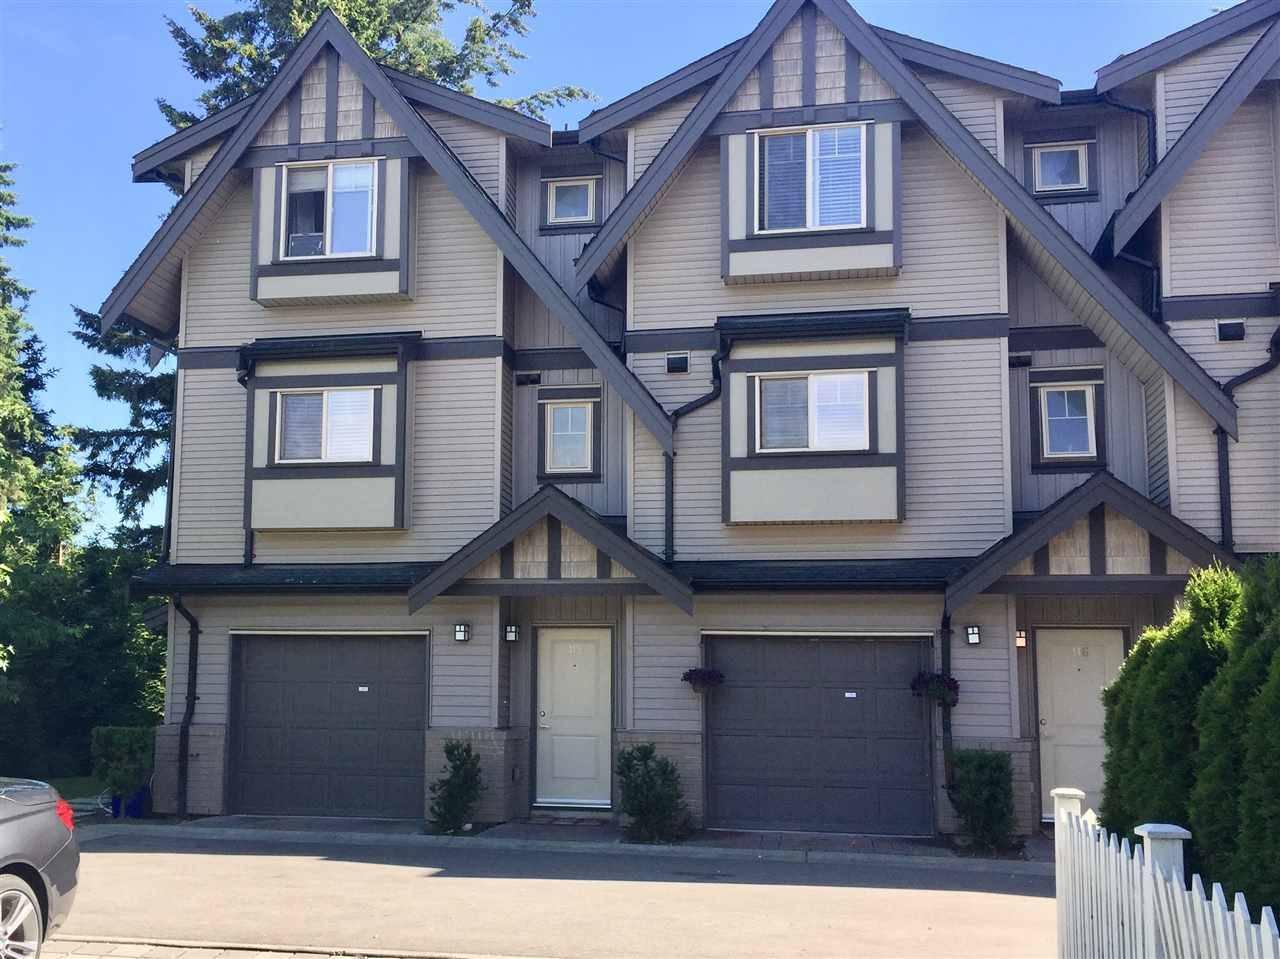 Buliding: 13368 72 Avenue, Surrey, BC